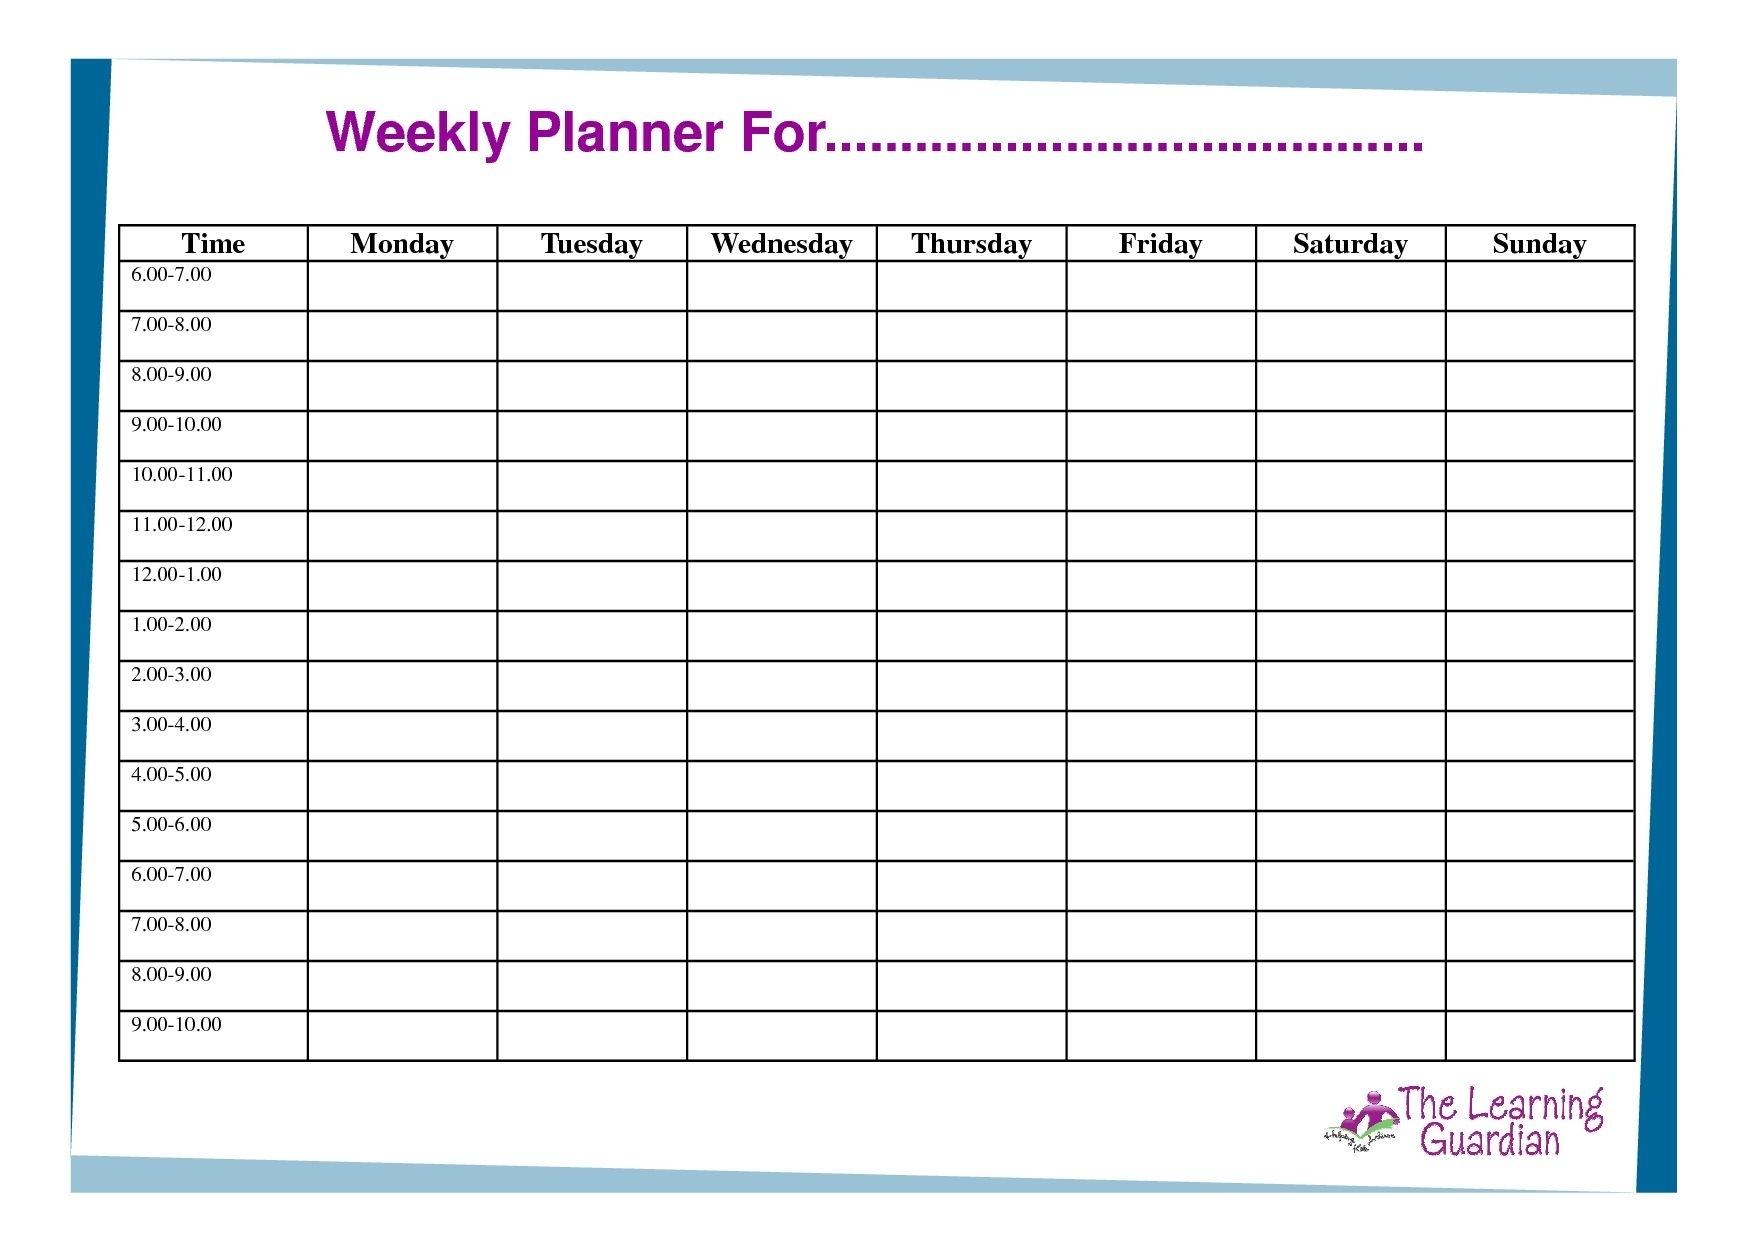 Monday Thru Friday Calendar 2020 Template In 2020 | Weekly